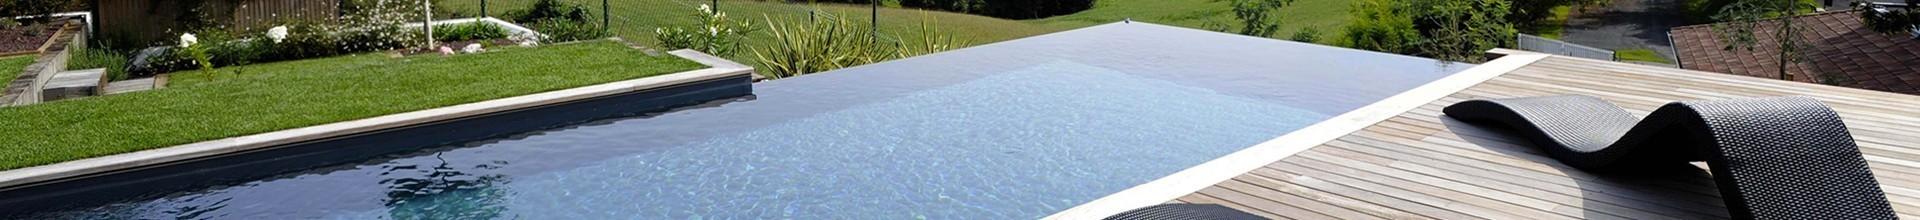 Luxembourg conception conteneur piscine coque sur mesure Grevenmacher